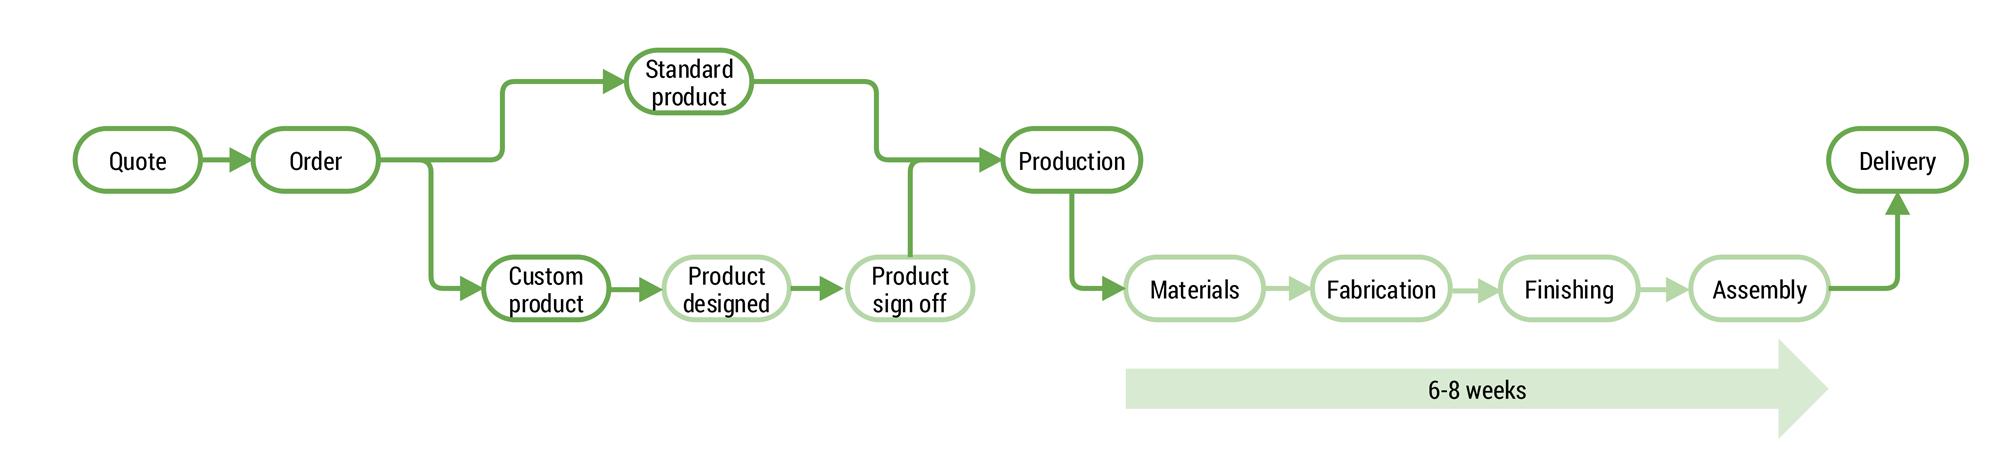 CSA Process Flow Chart